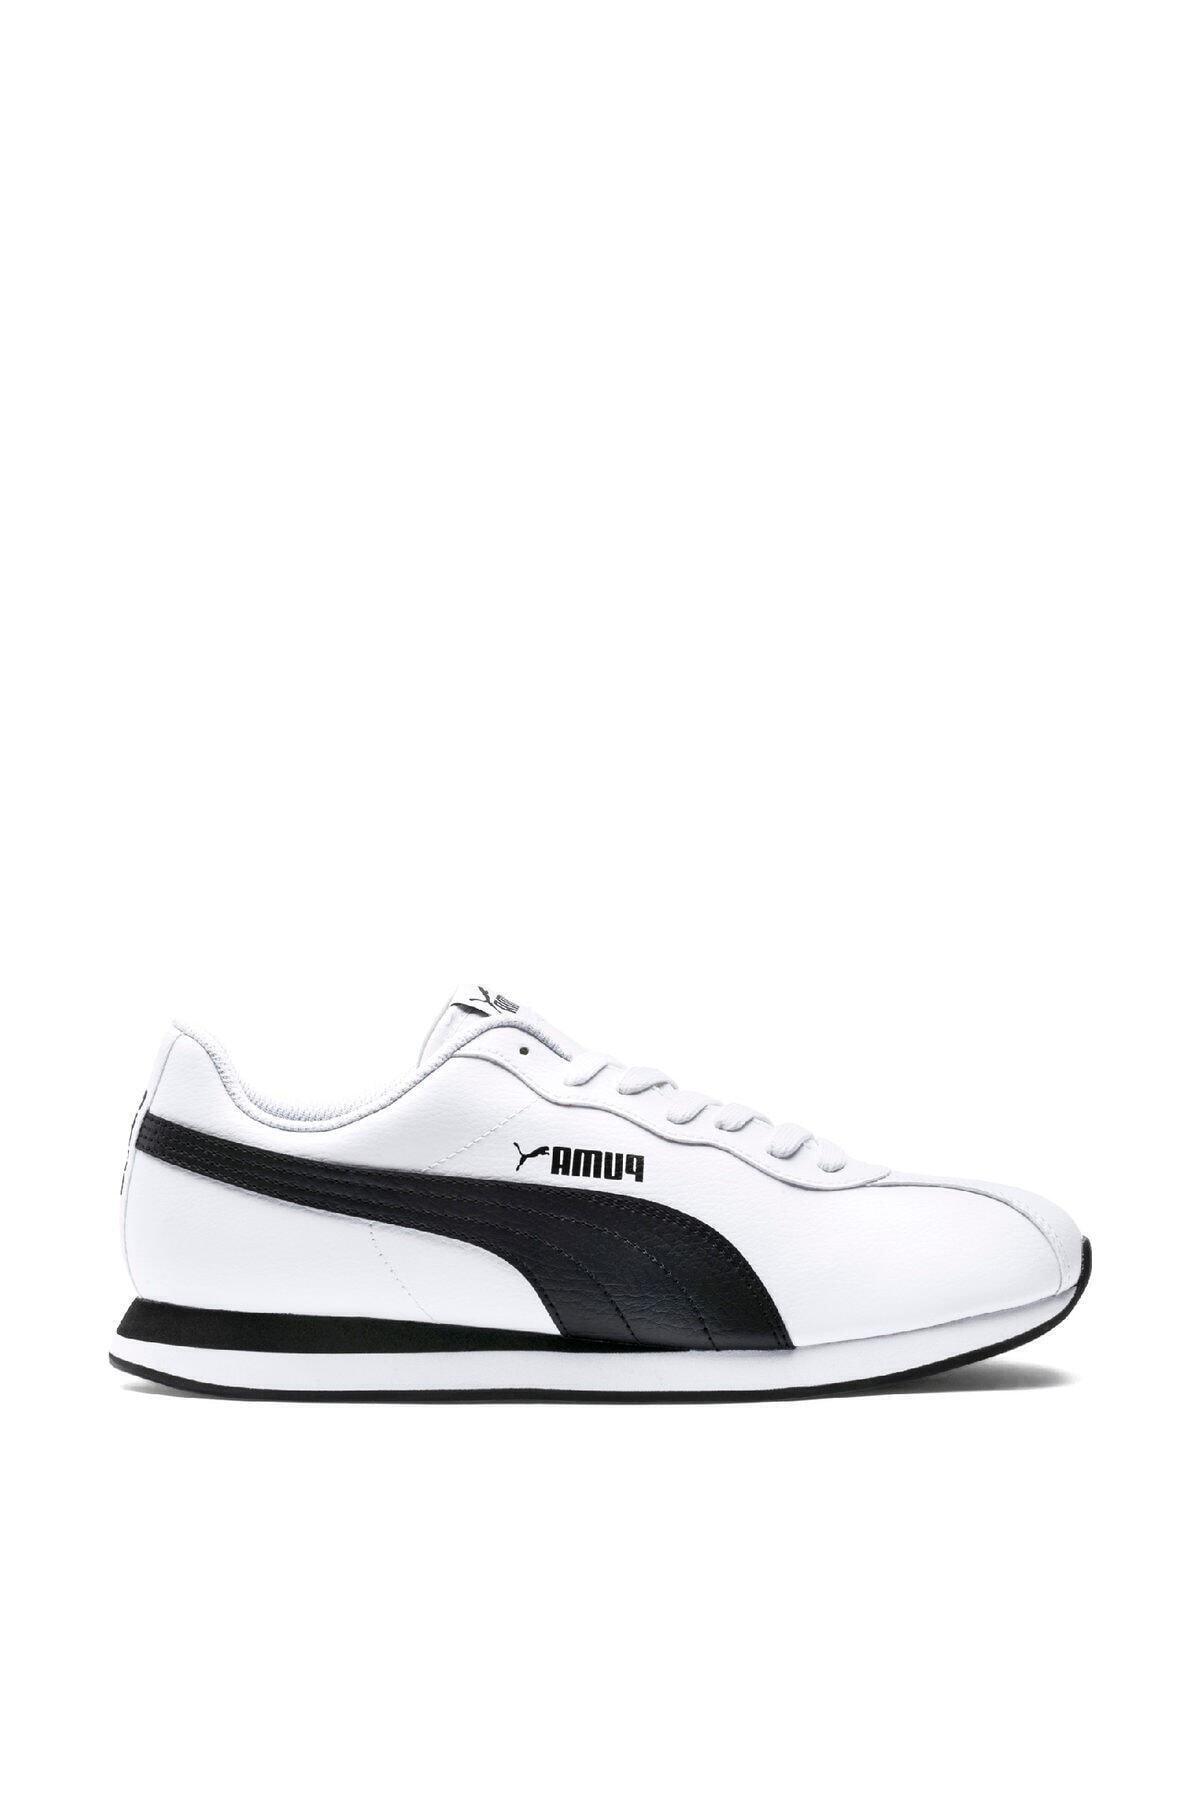 Puma Turin Ii Beyaz Siyah Erkek Sneaker Ayakkabı 100352194 1